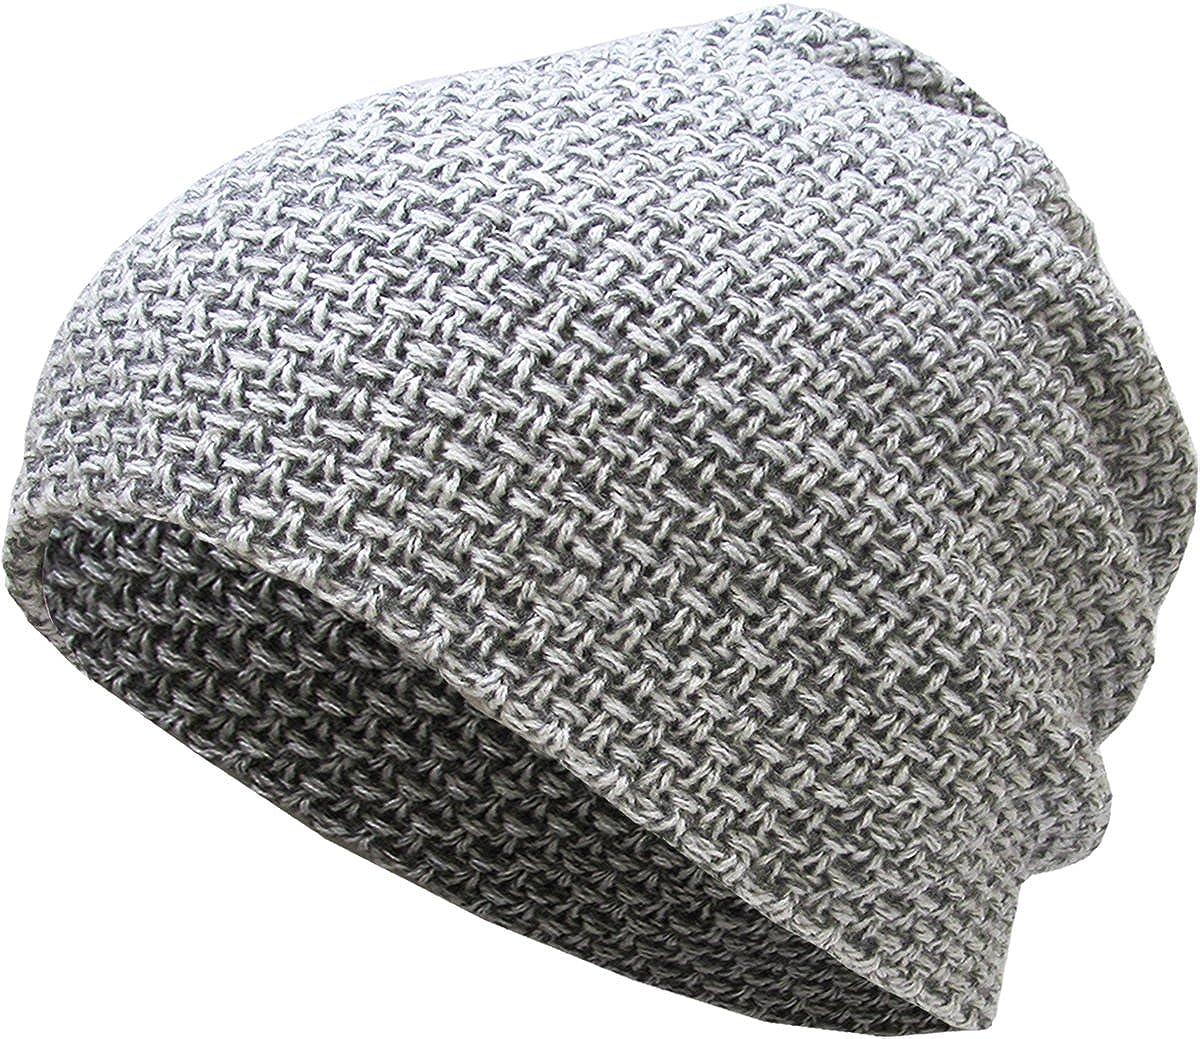 13eb05898f6 Amazon.com  KBW-251 LGY Waffle Knit Slouchy Beanie Baggy Style Skull Cap  Winter Unisex Ski Hat  Clothing